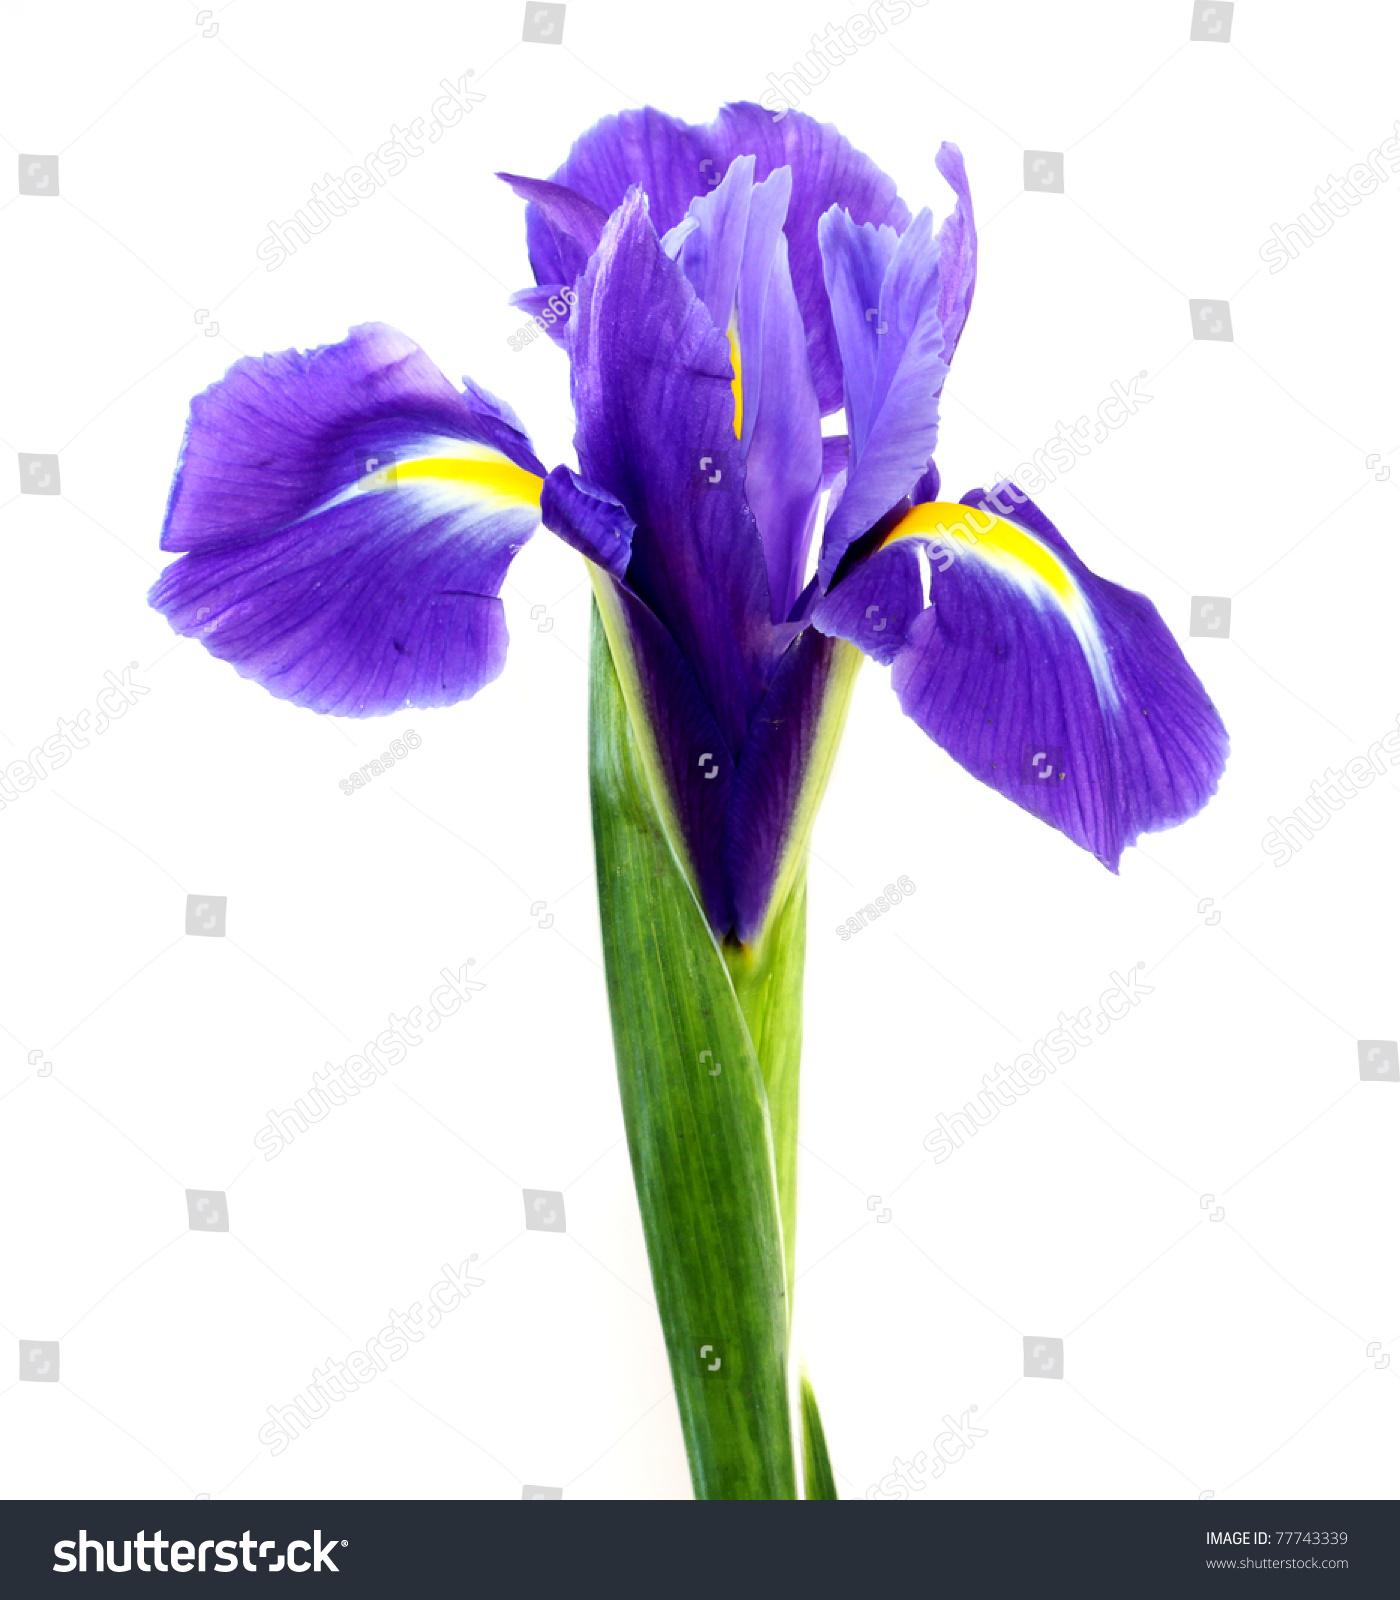 Beautiful dark purple iris flower isolated on white background ez beautiful dark purple iris flower isolated on white background ez canvas izmirmasajfo